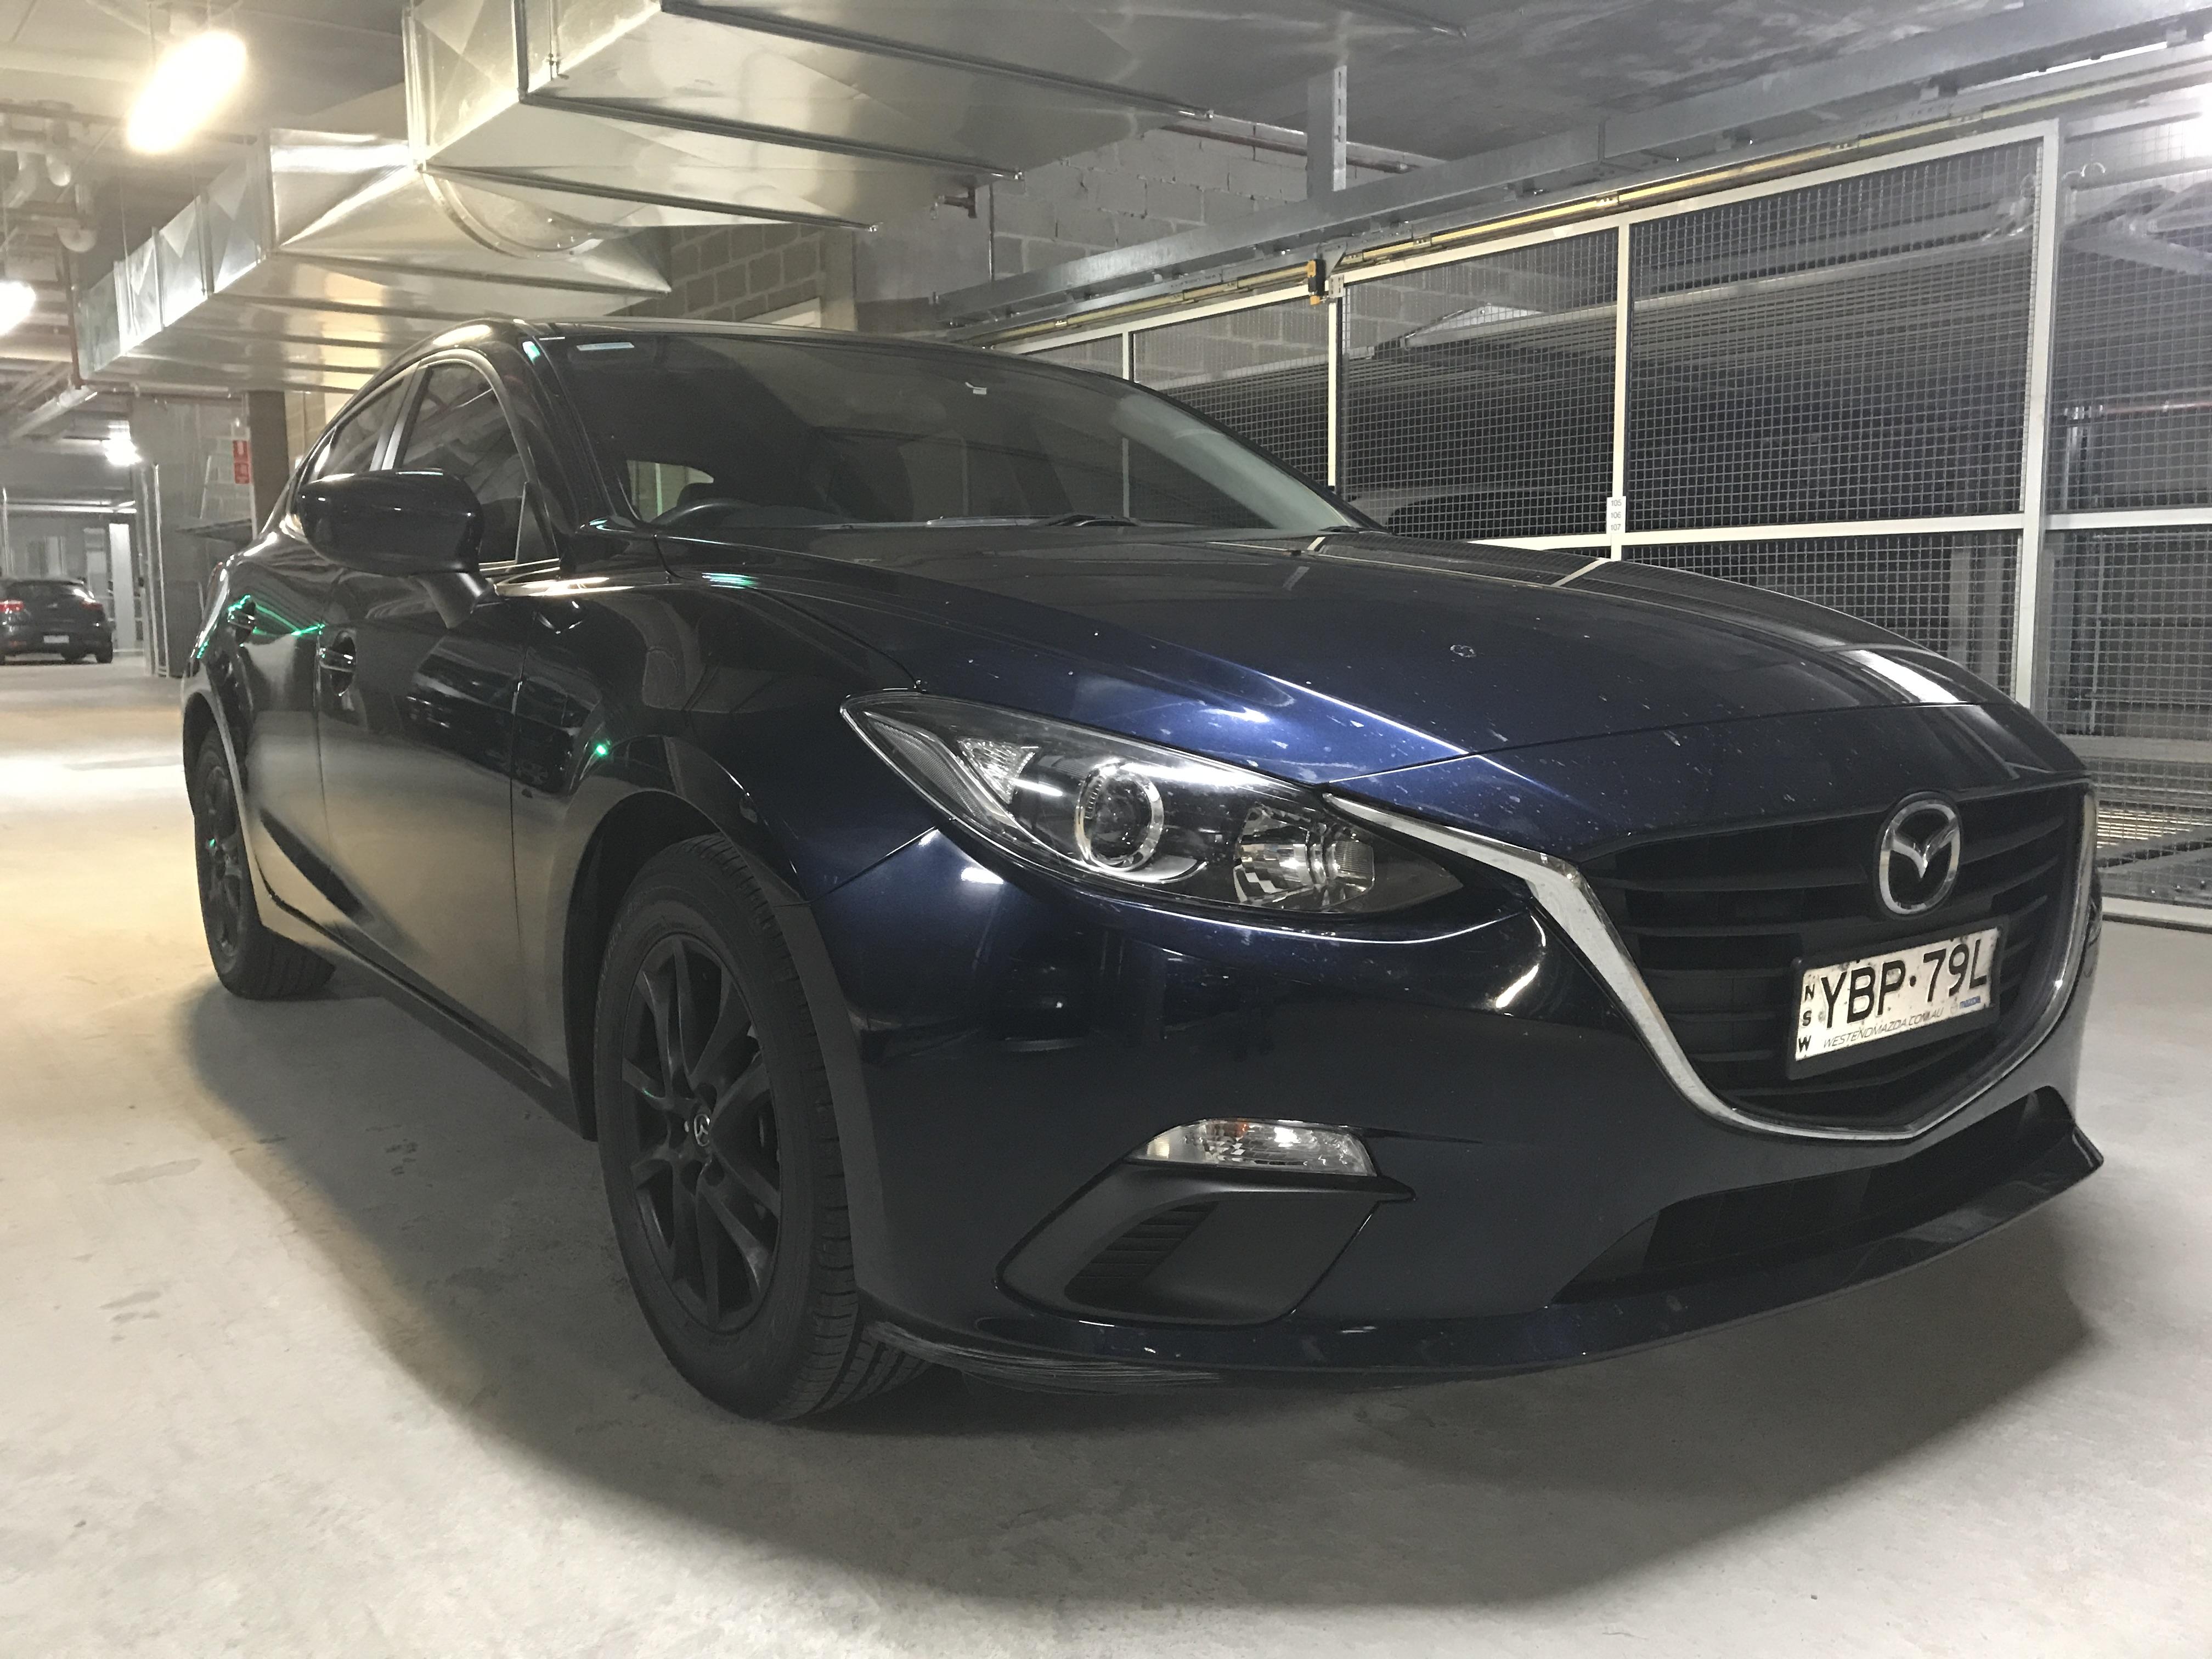 Picture of Milena's 2014 Mazda 3